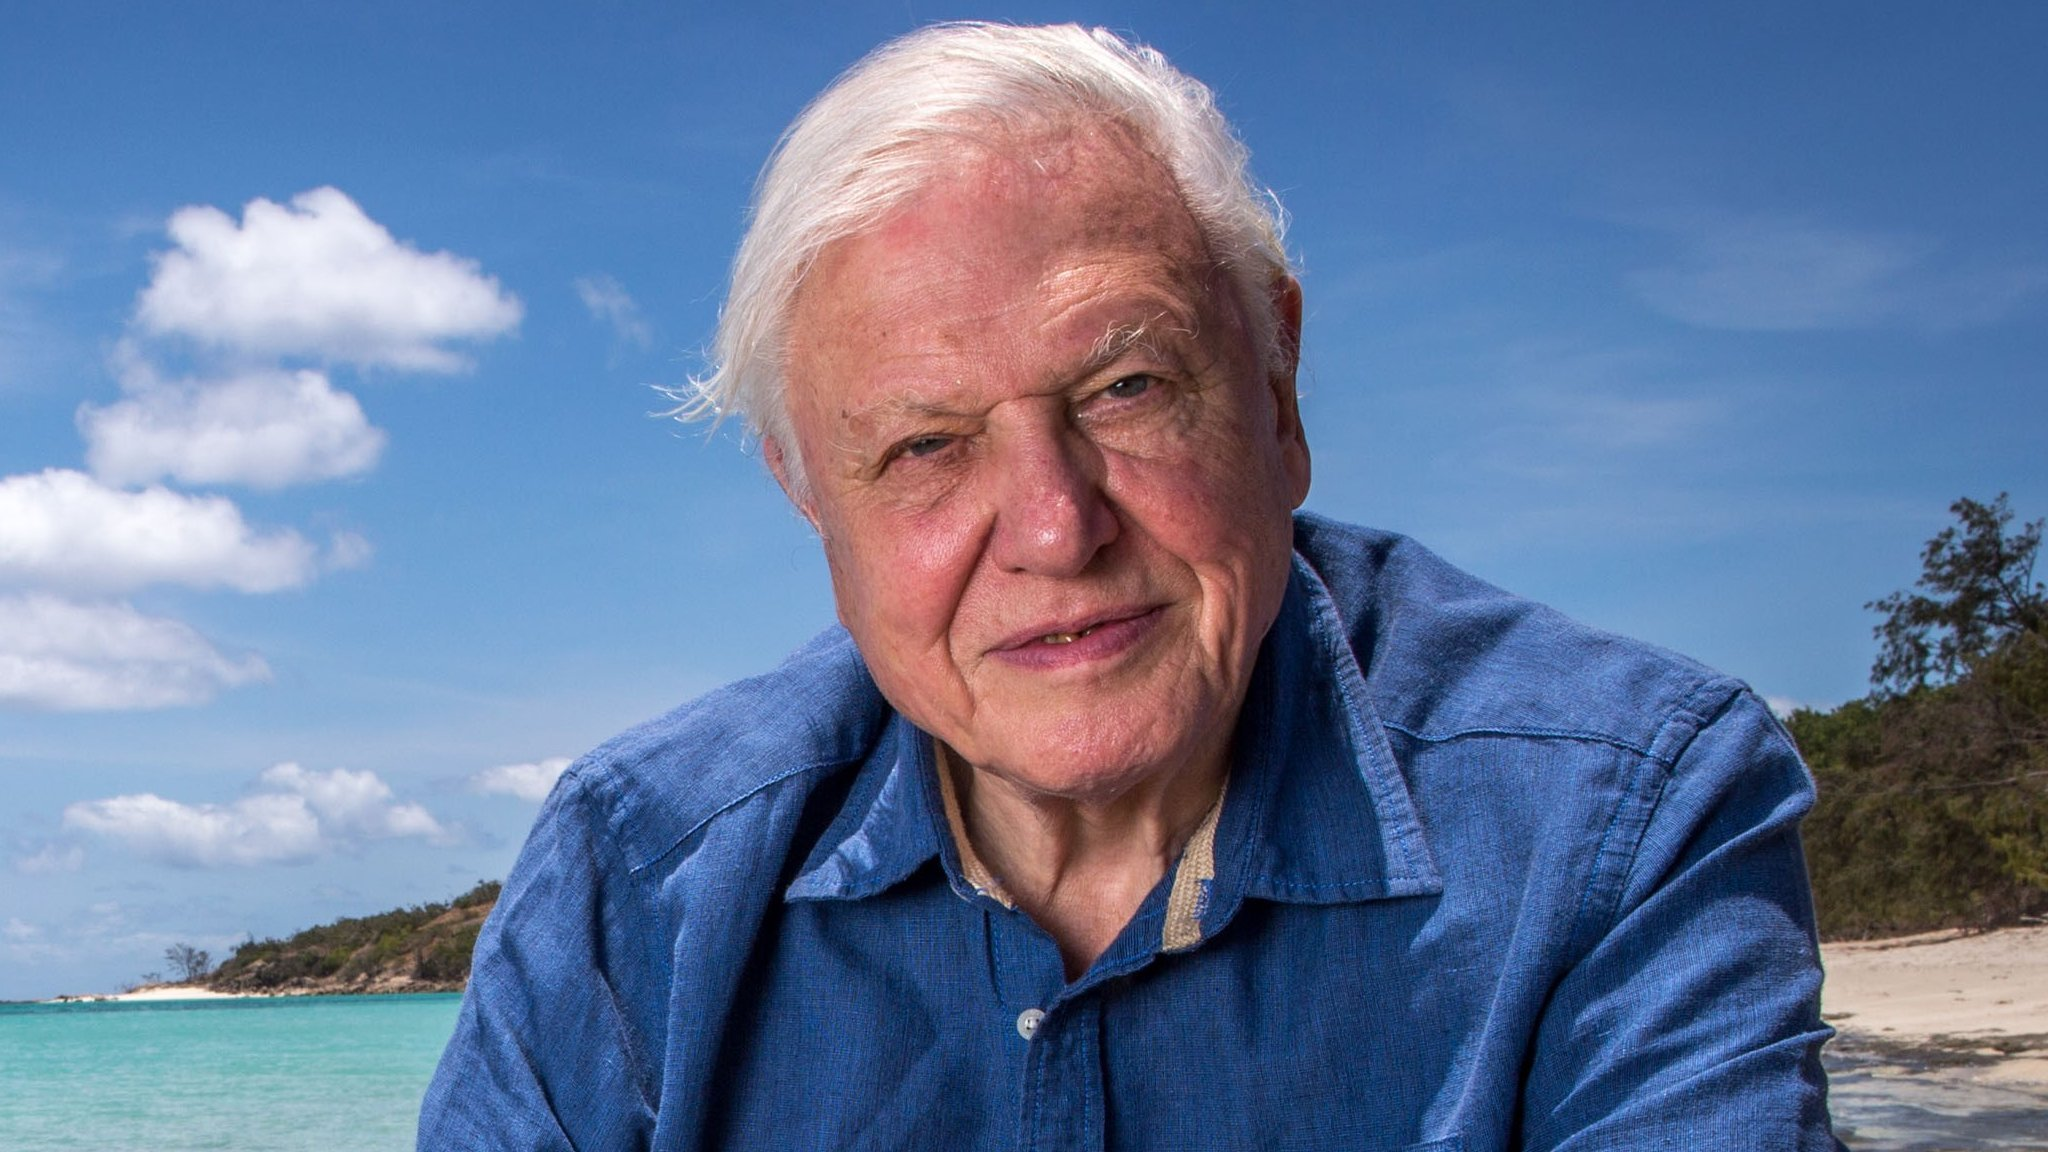 David Attenborough says BBC should prioritise arts